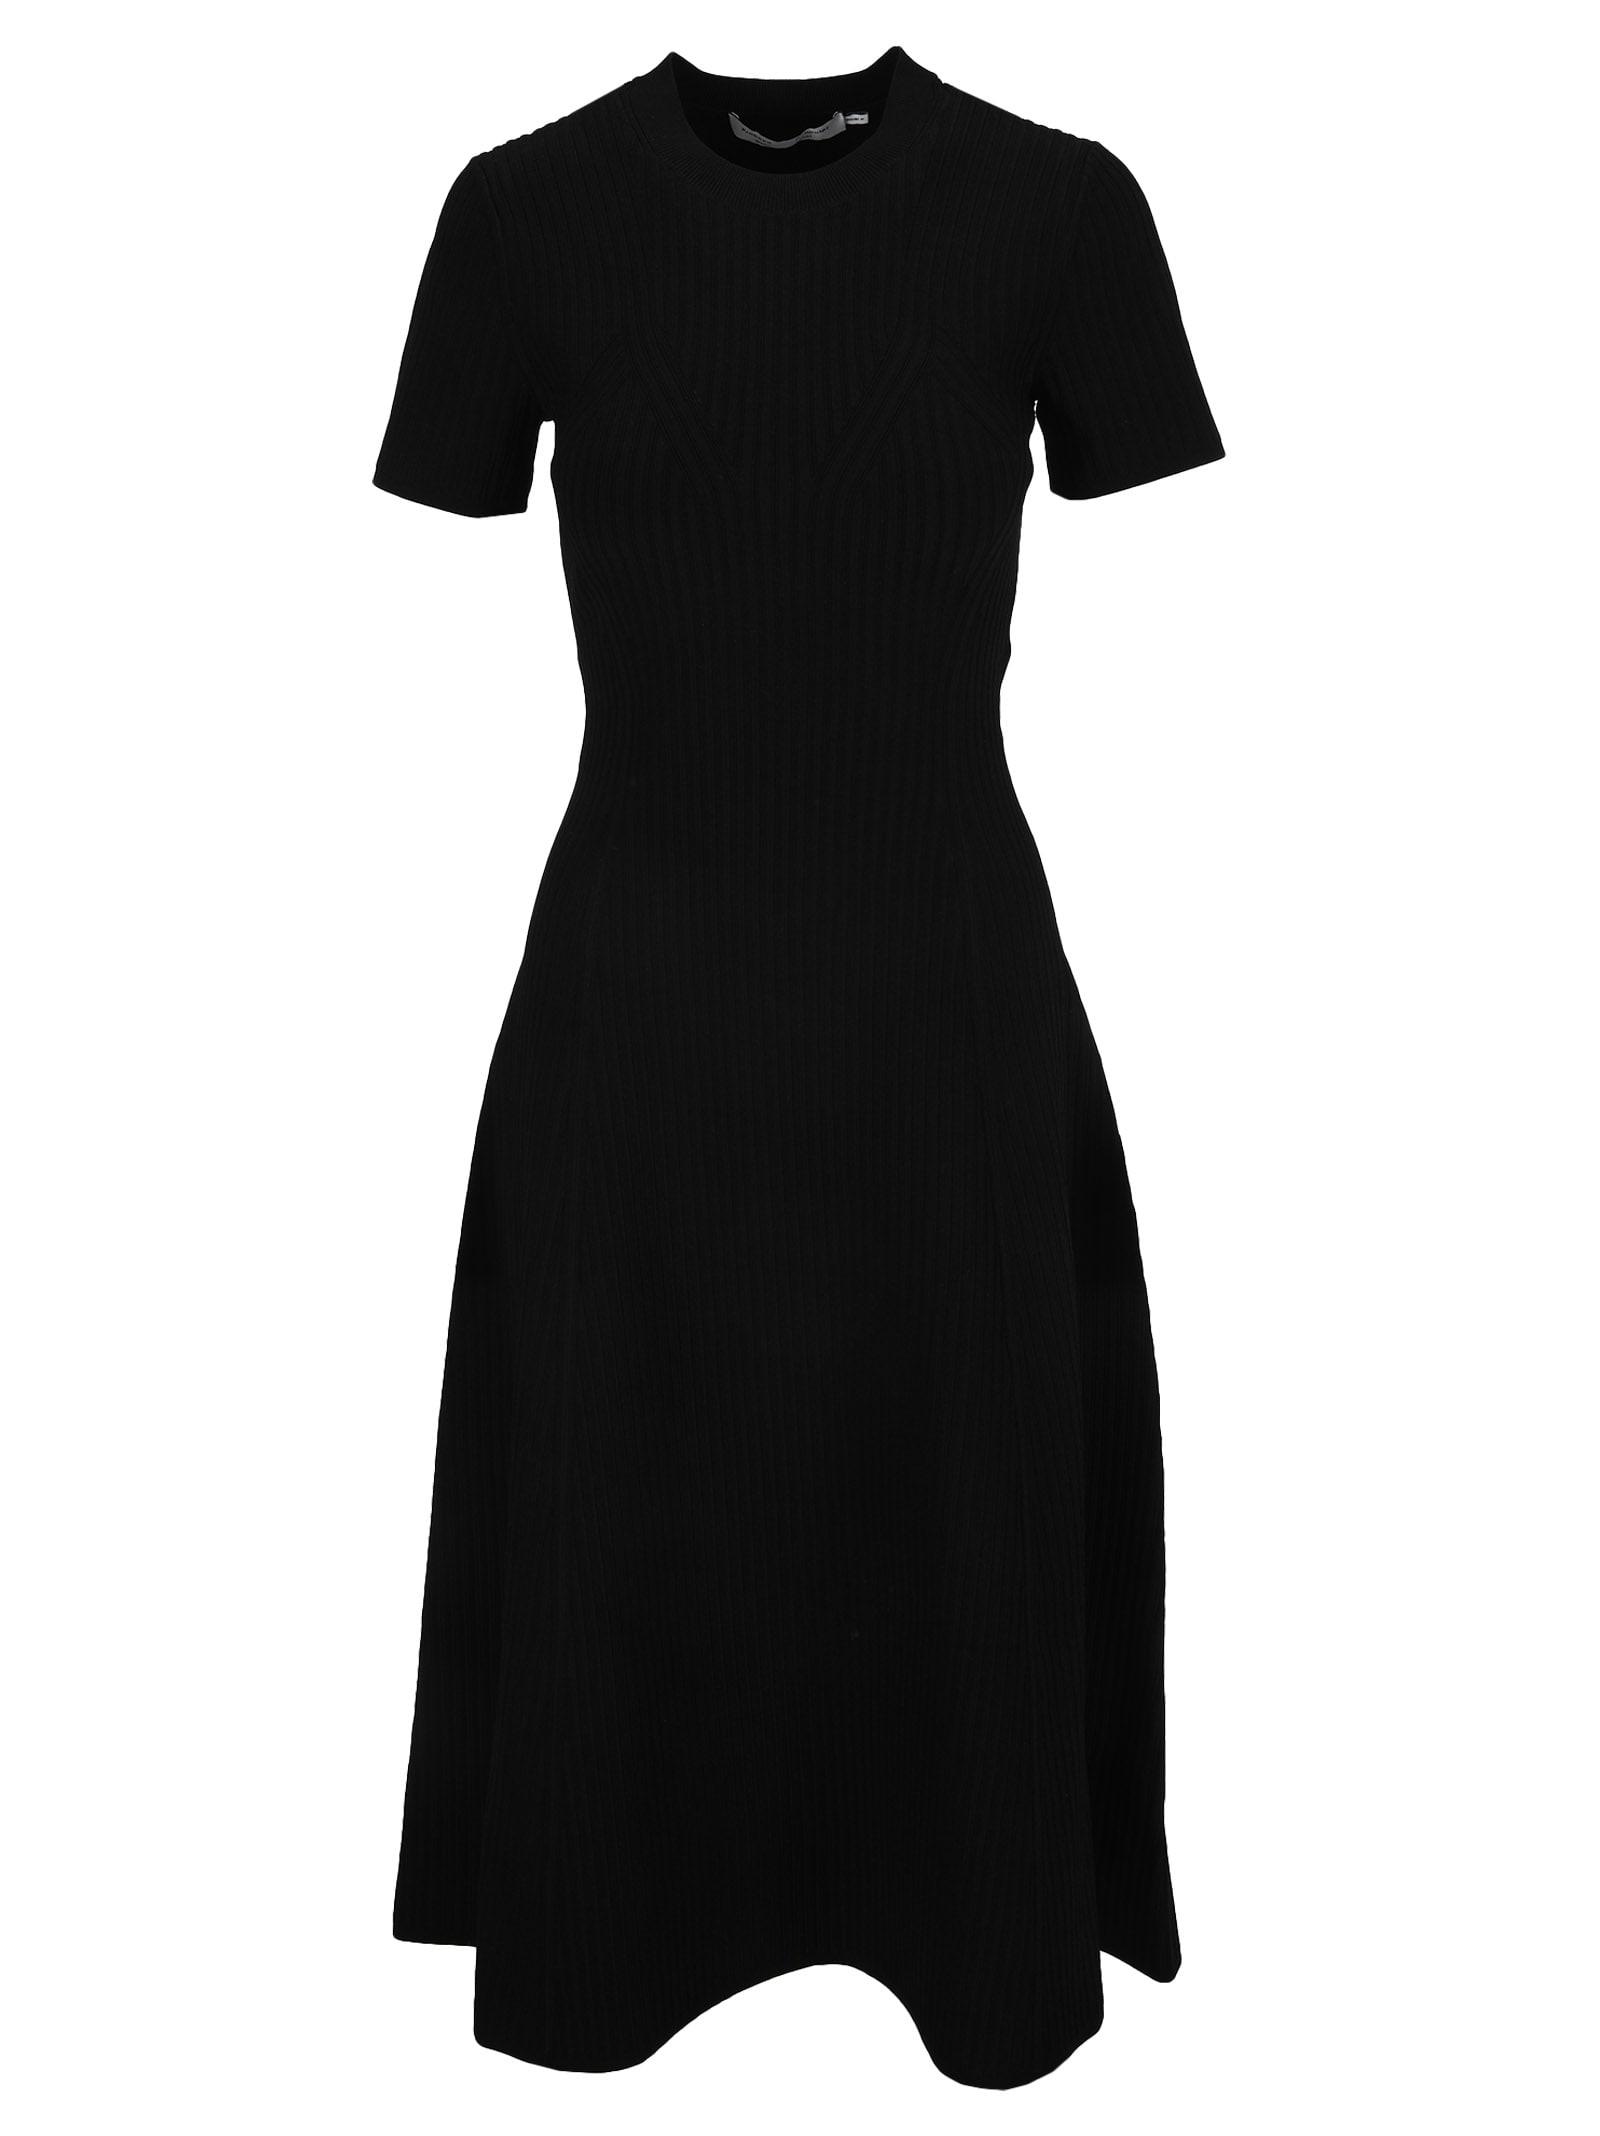 Proenza Schouler Cut-out Back Knit Dress